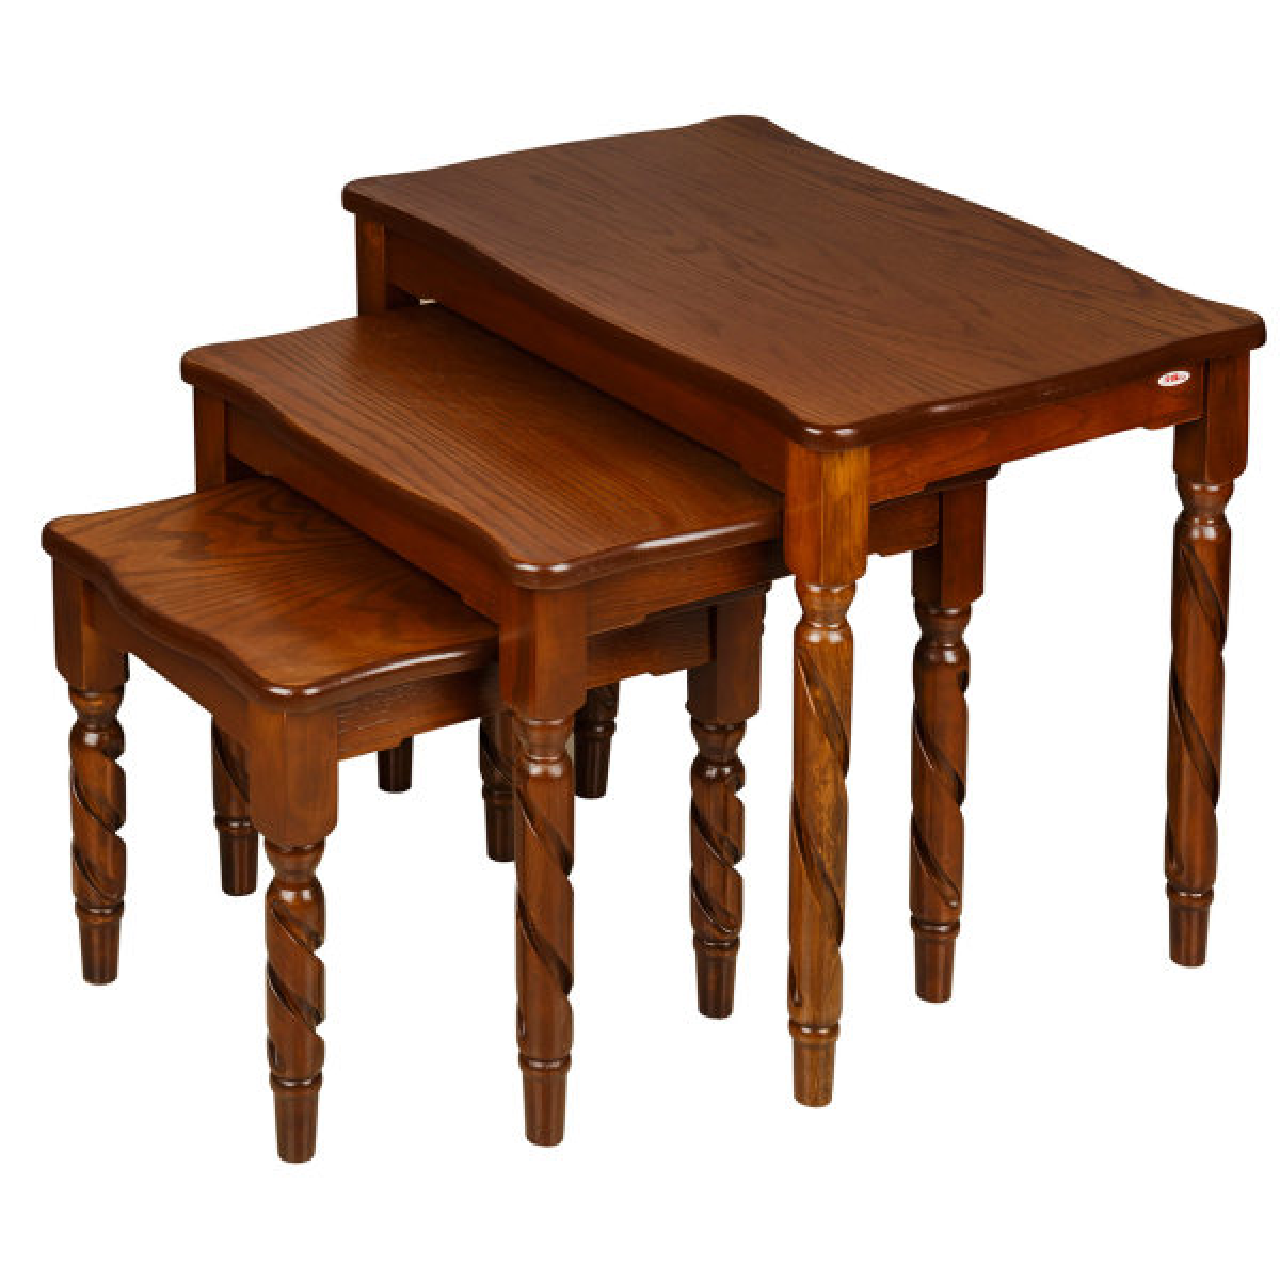 میز عسلی چشمه نور کد D-111 مجموعه 3 عددی